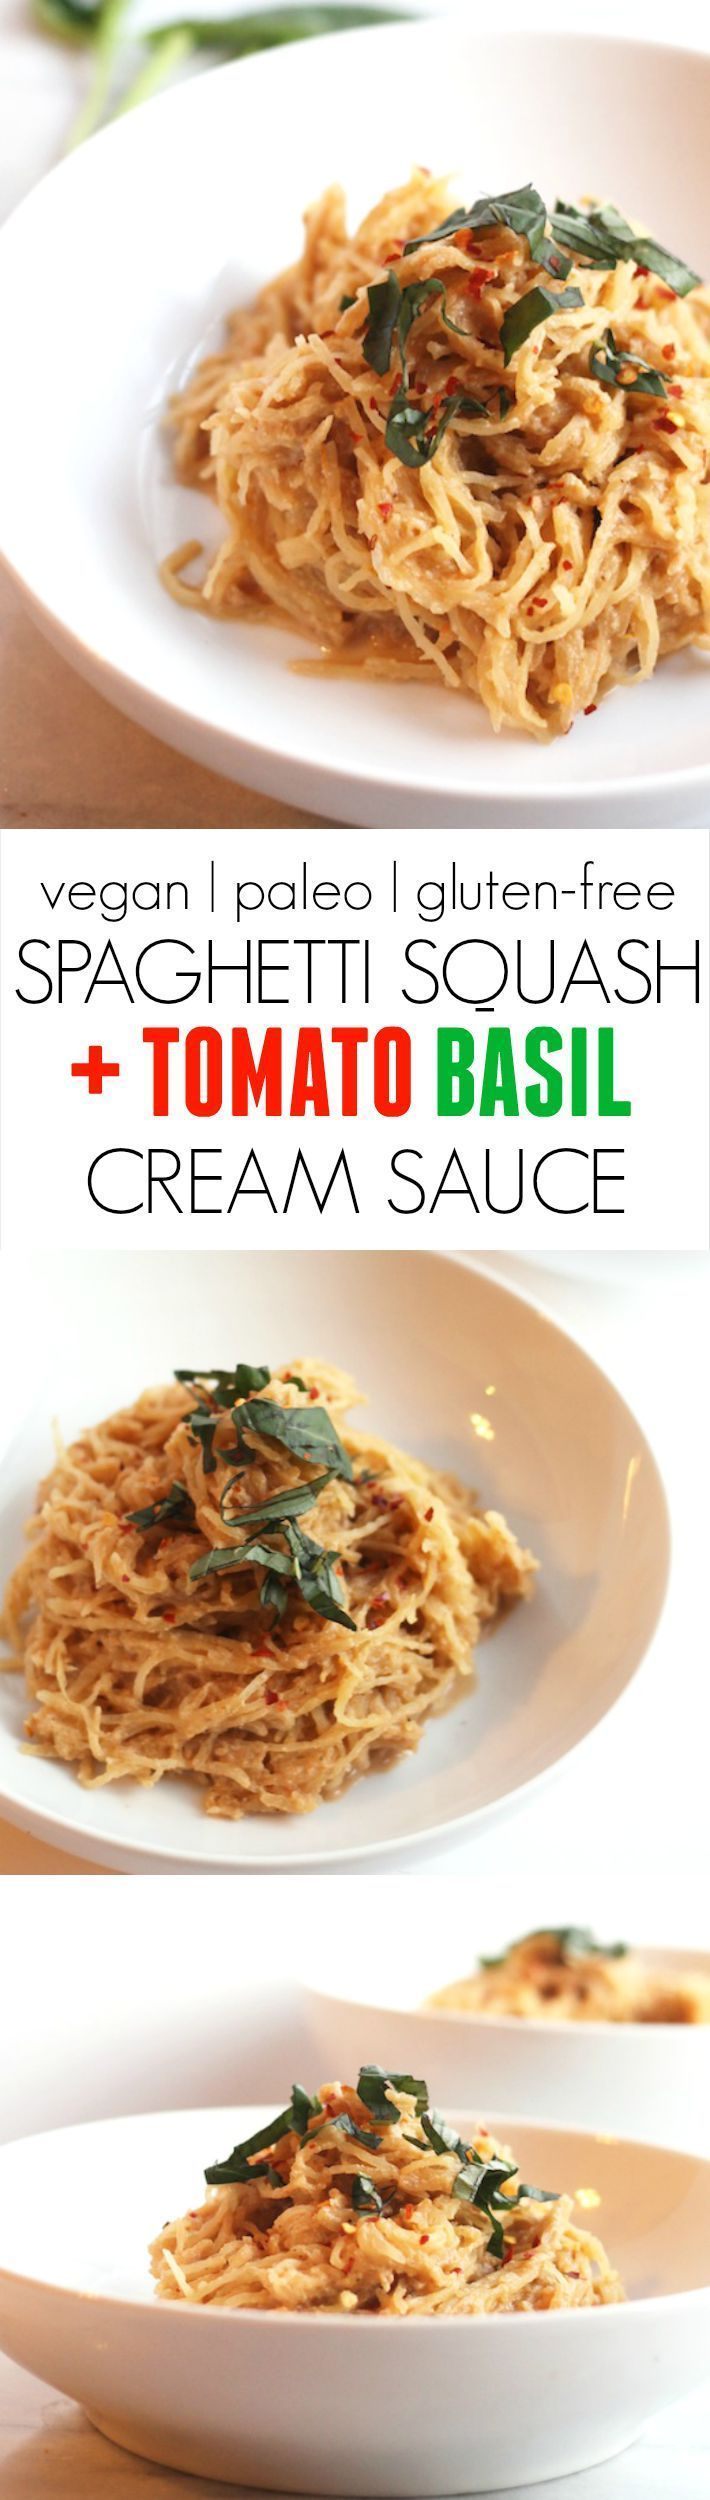 Spaghetti Squash with Tomato Basil Cream Sauce -- A super easy, kid-friendly, vegan, pale, and gluten-free main dish the whole family will devour!